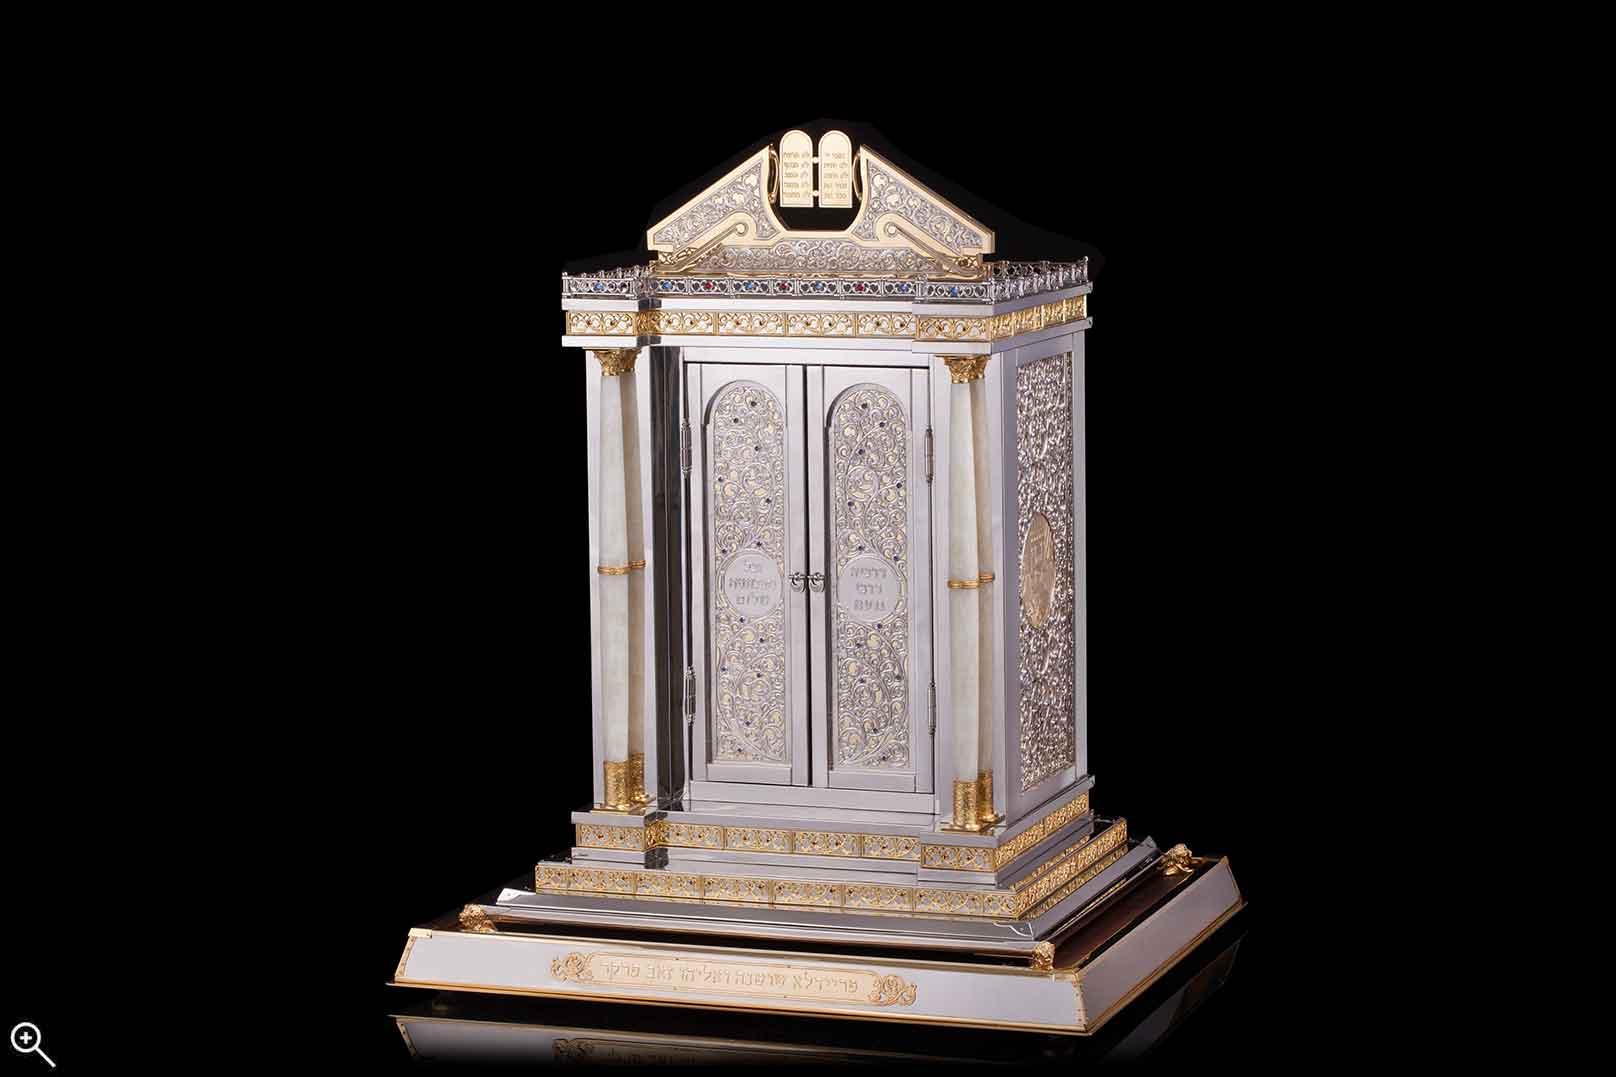 Torah Ark with Onyx Pillars